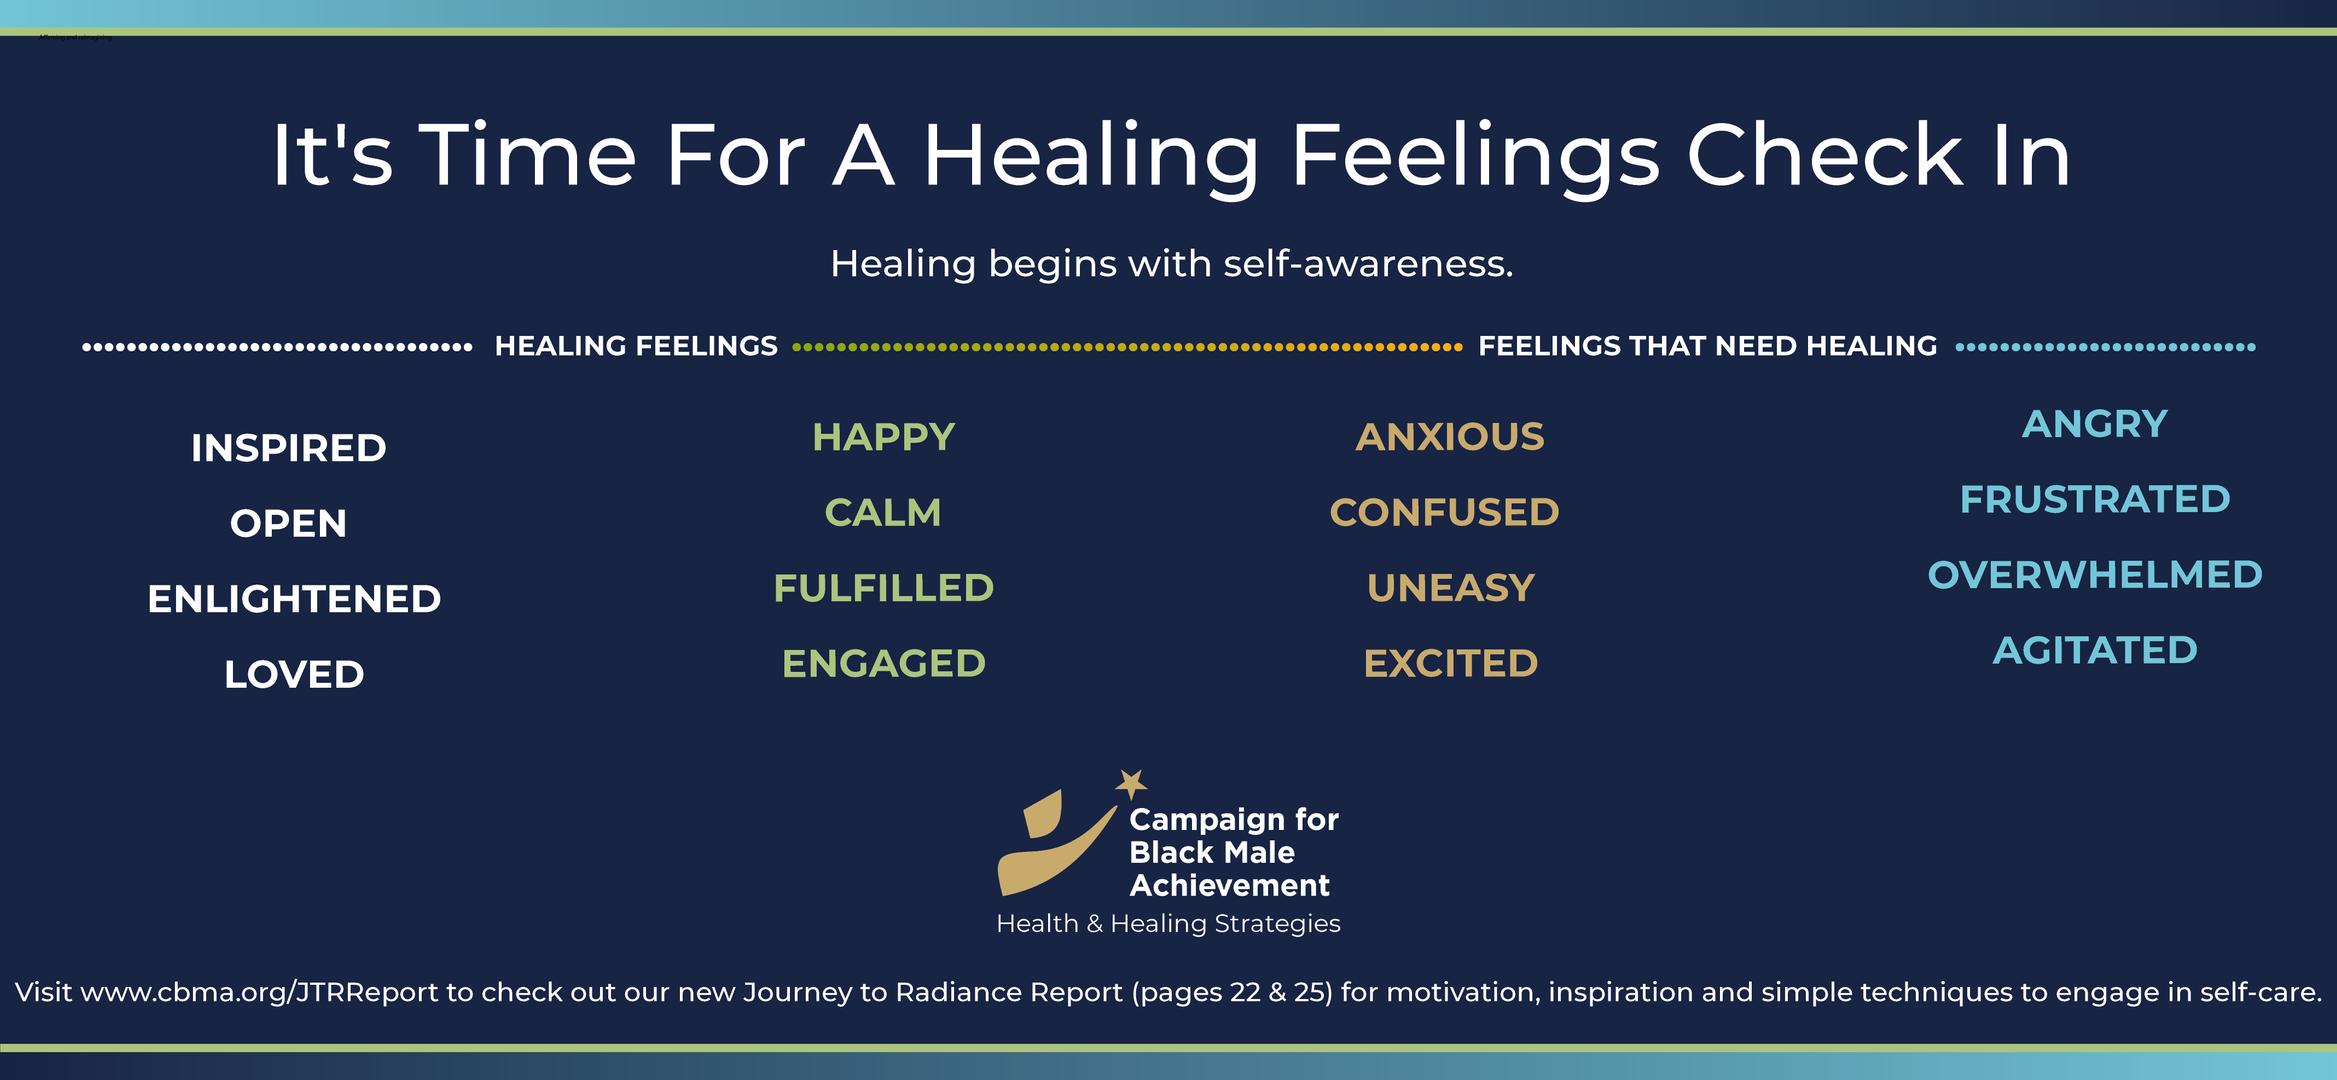 Healing feelings check in